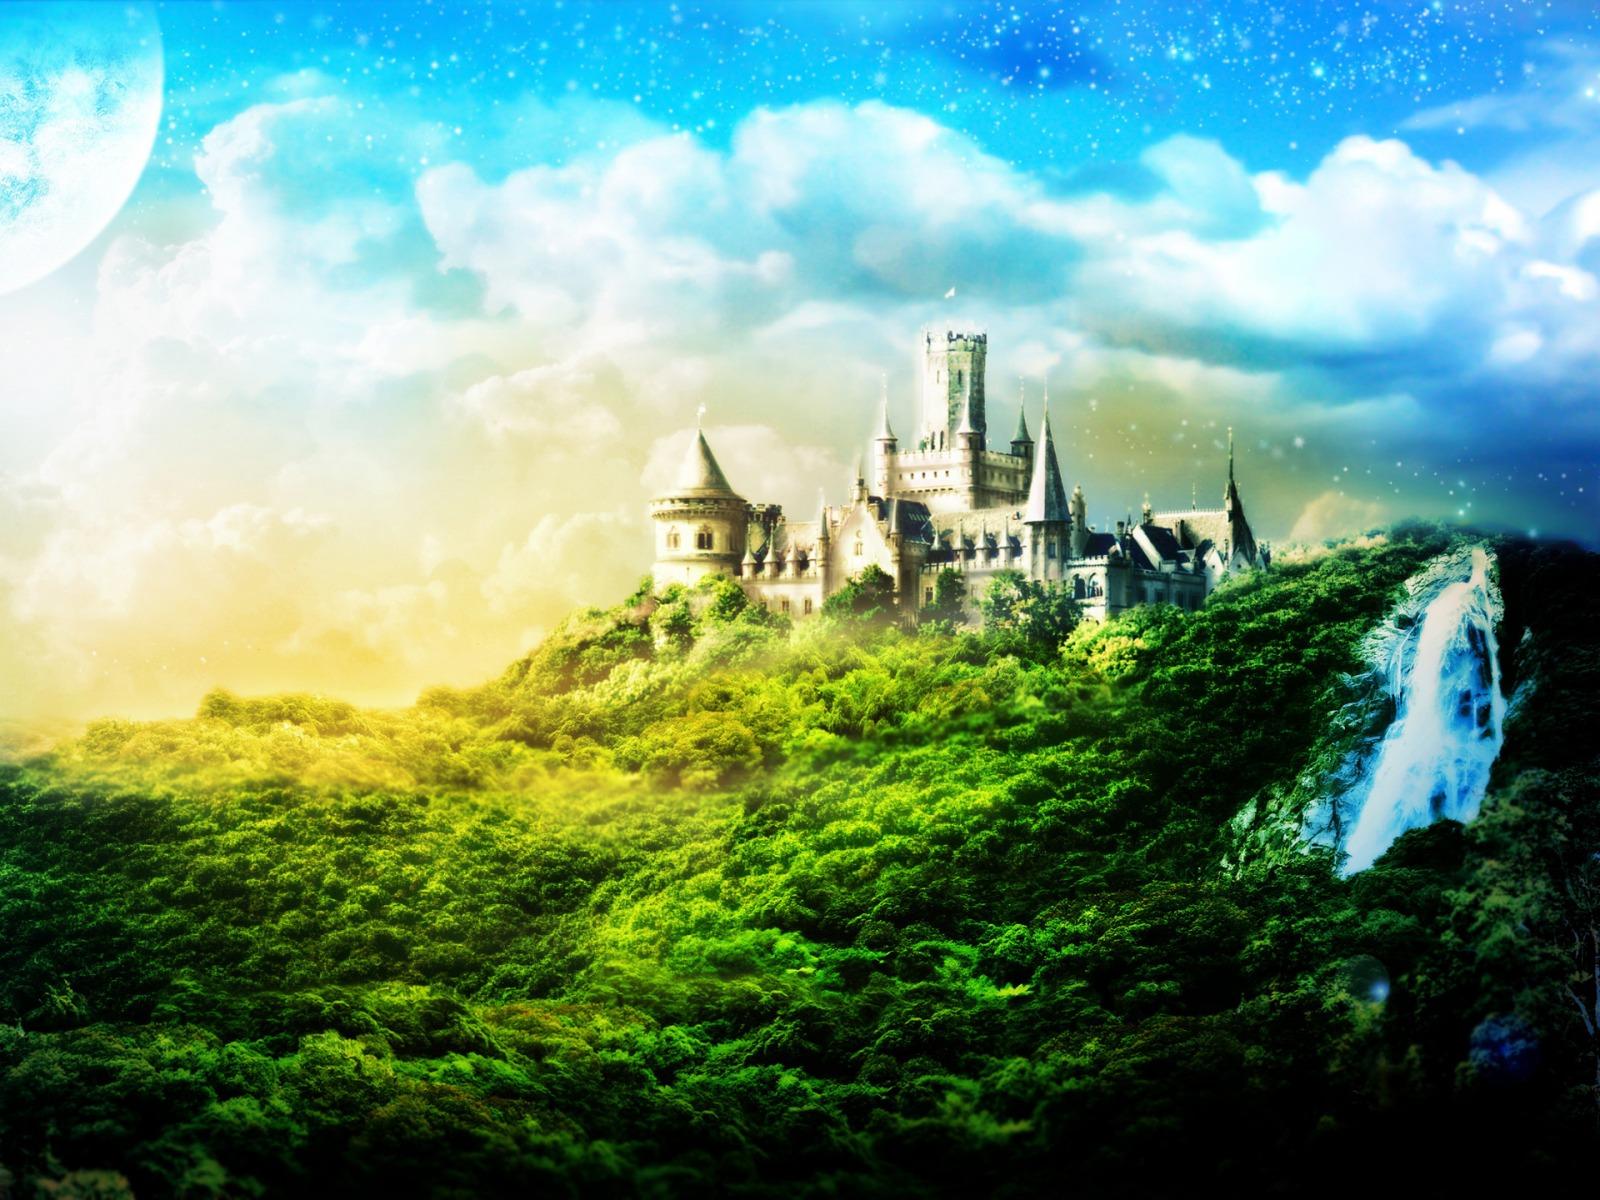 Fantasy Castle 1600 X 1200 Wallpaper 4232   HD Desktop Wallpaper 1600x1200